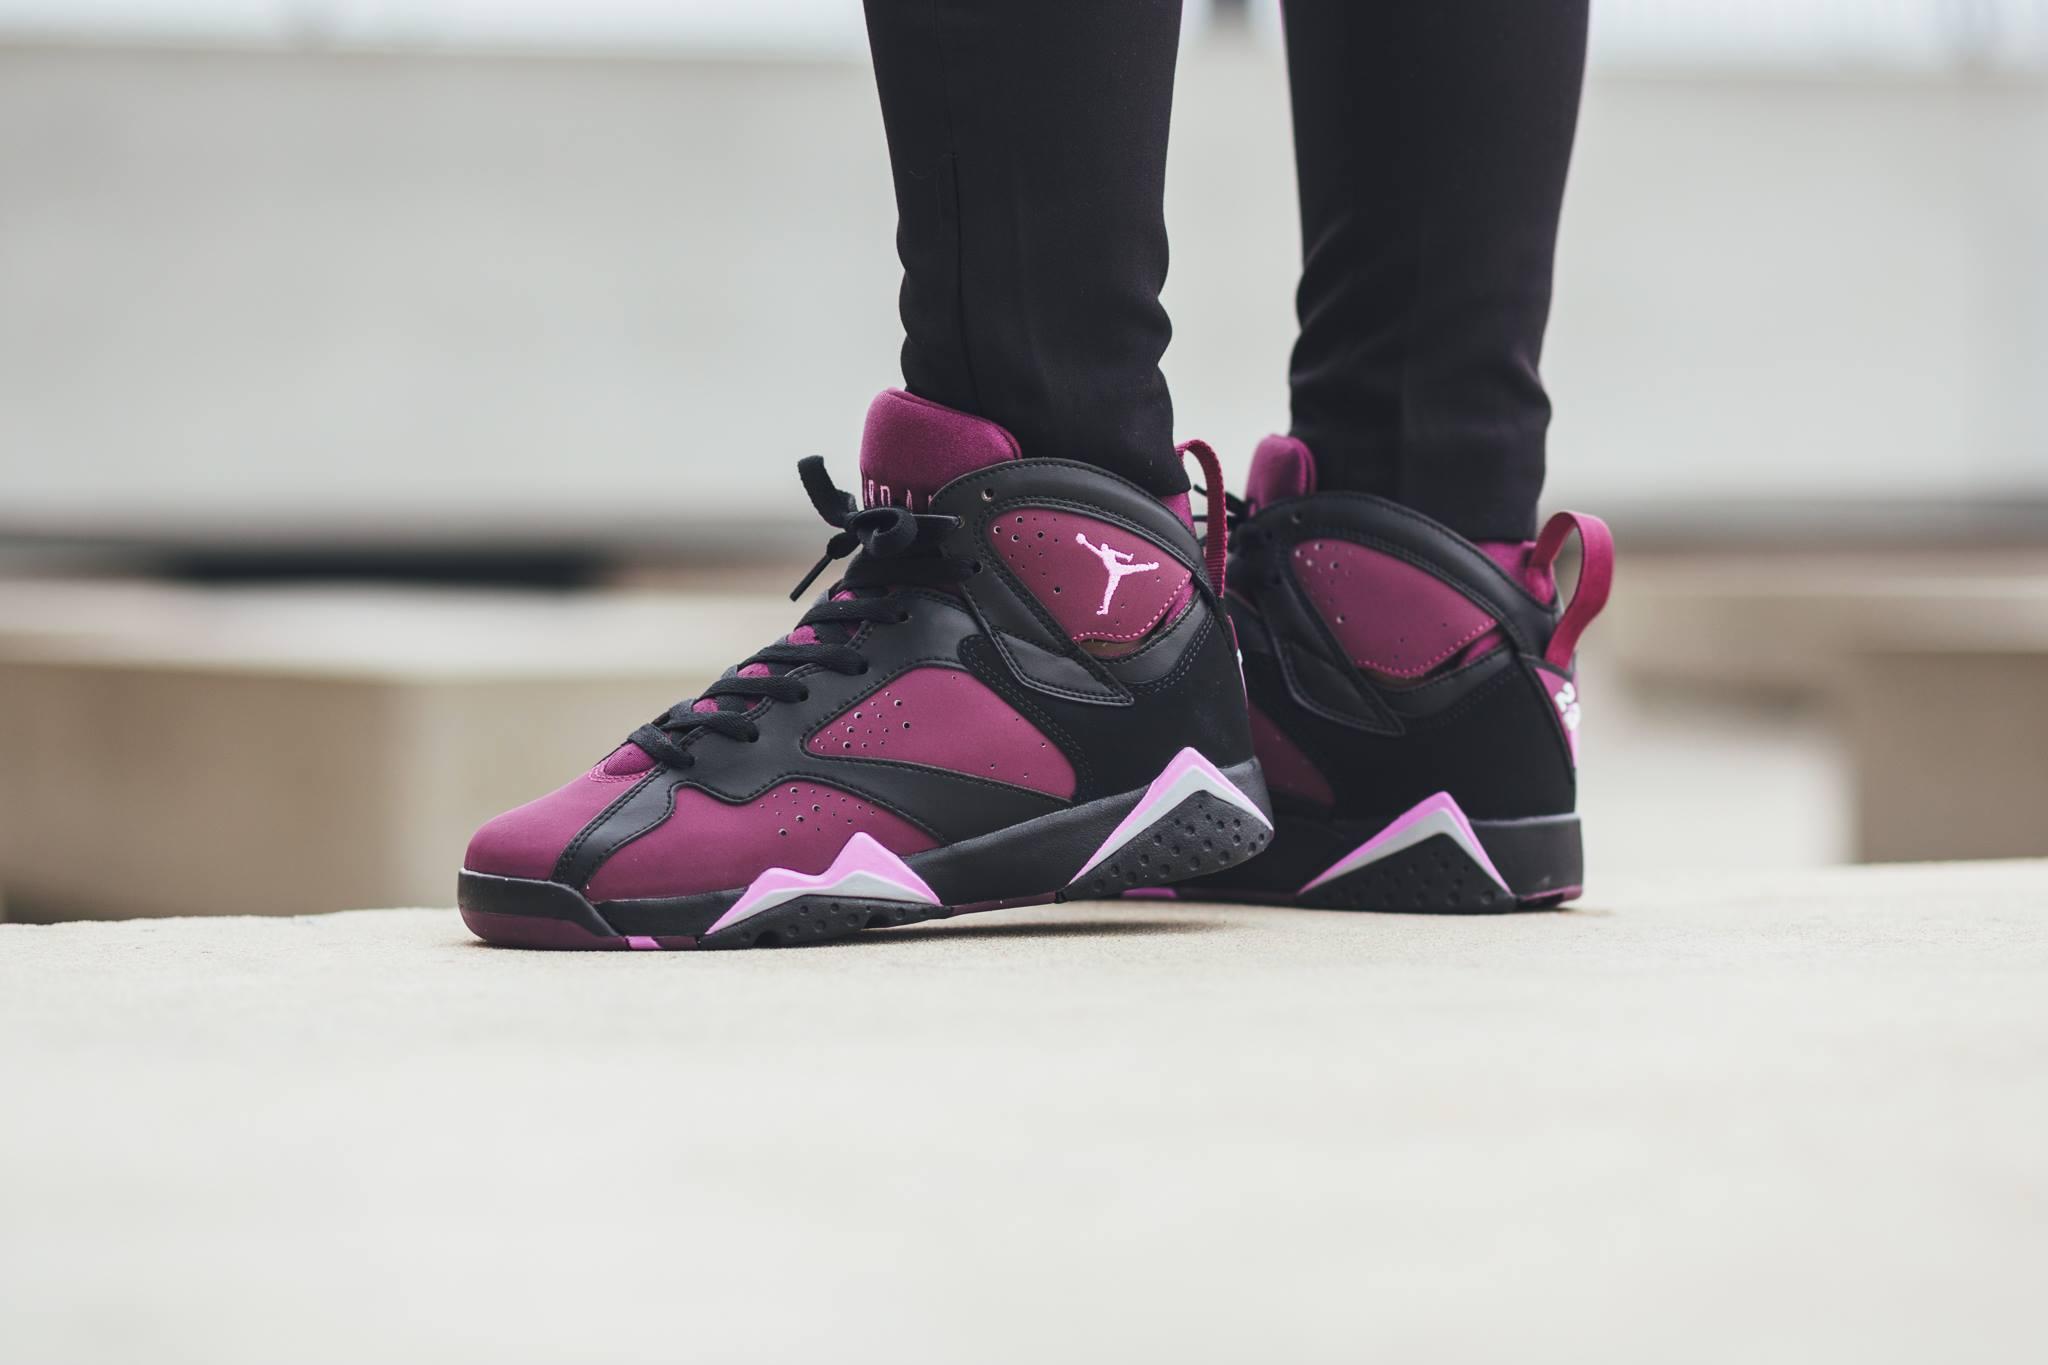 nike jordan 7 femme,Air Jordan 7 Retro - www.dlconseils.fr